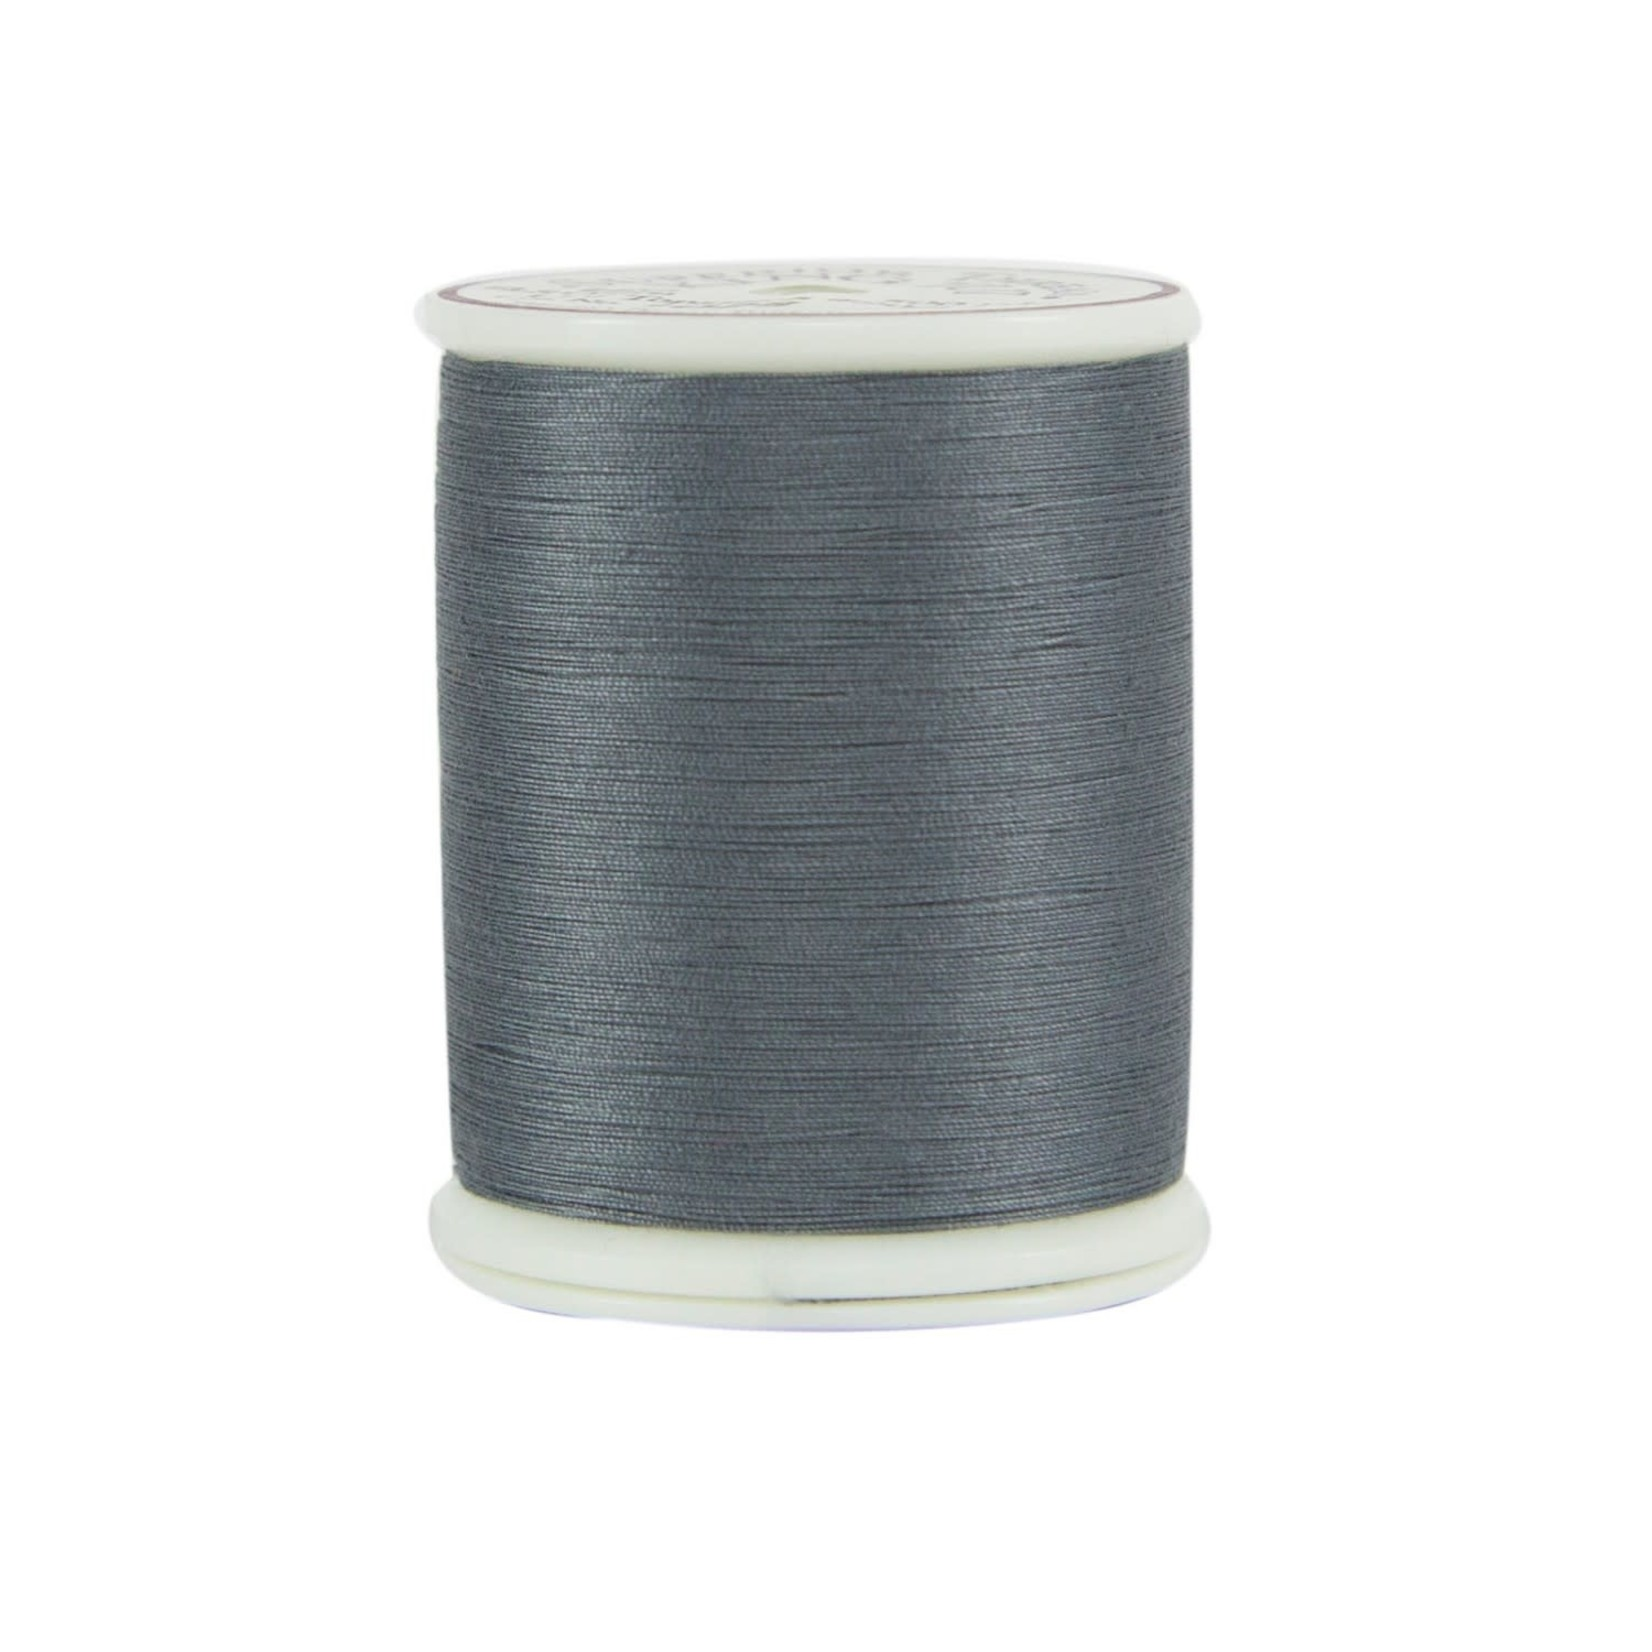 Superior Threads King Tut - #40 - 457 m - 1028 Silver Bullet